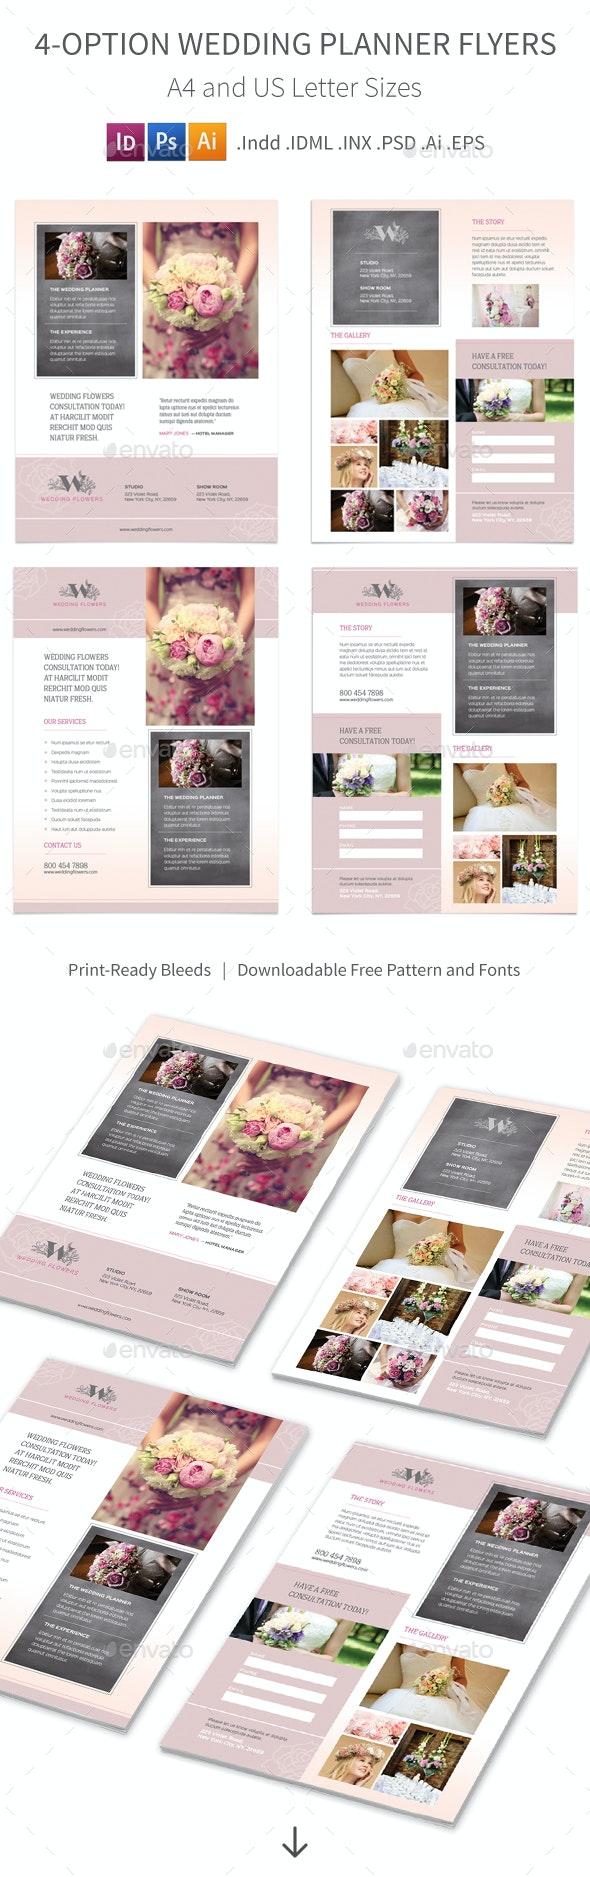 Wedding Planner Flyers – 4 Options - Corporate Flyers